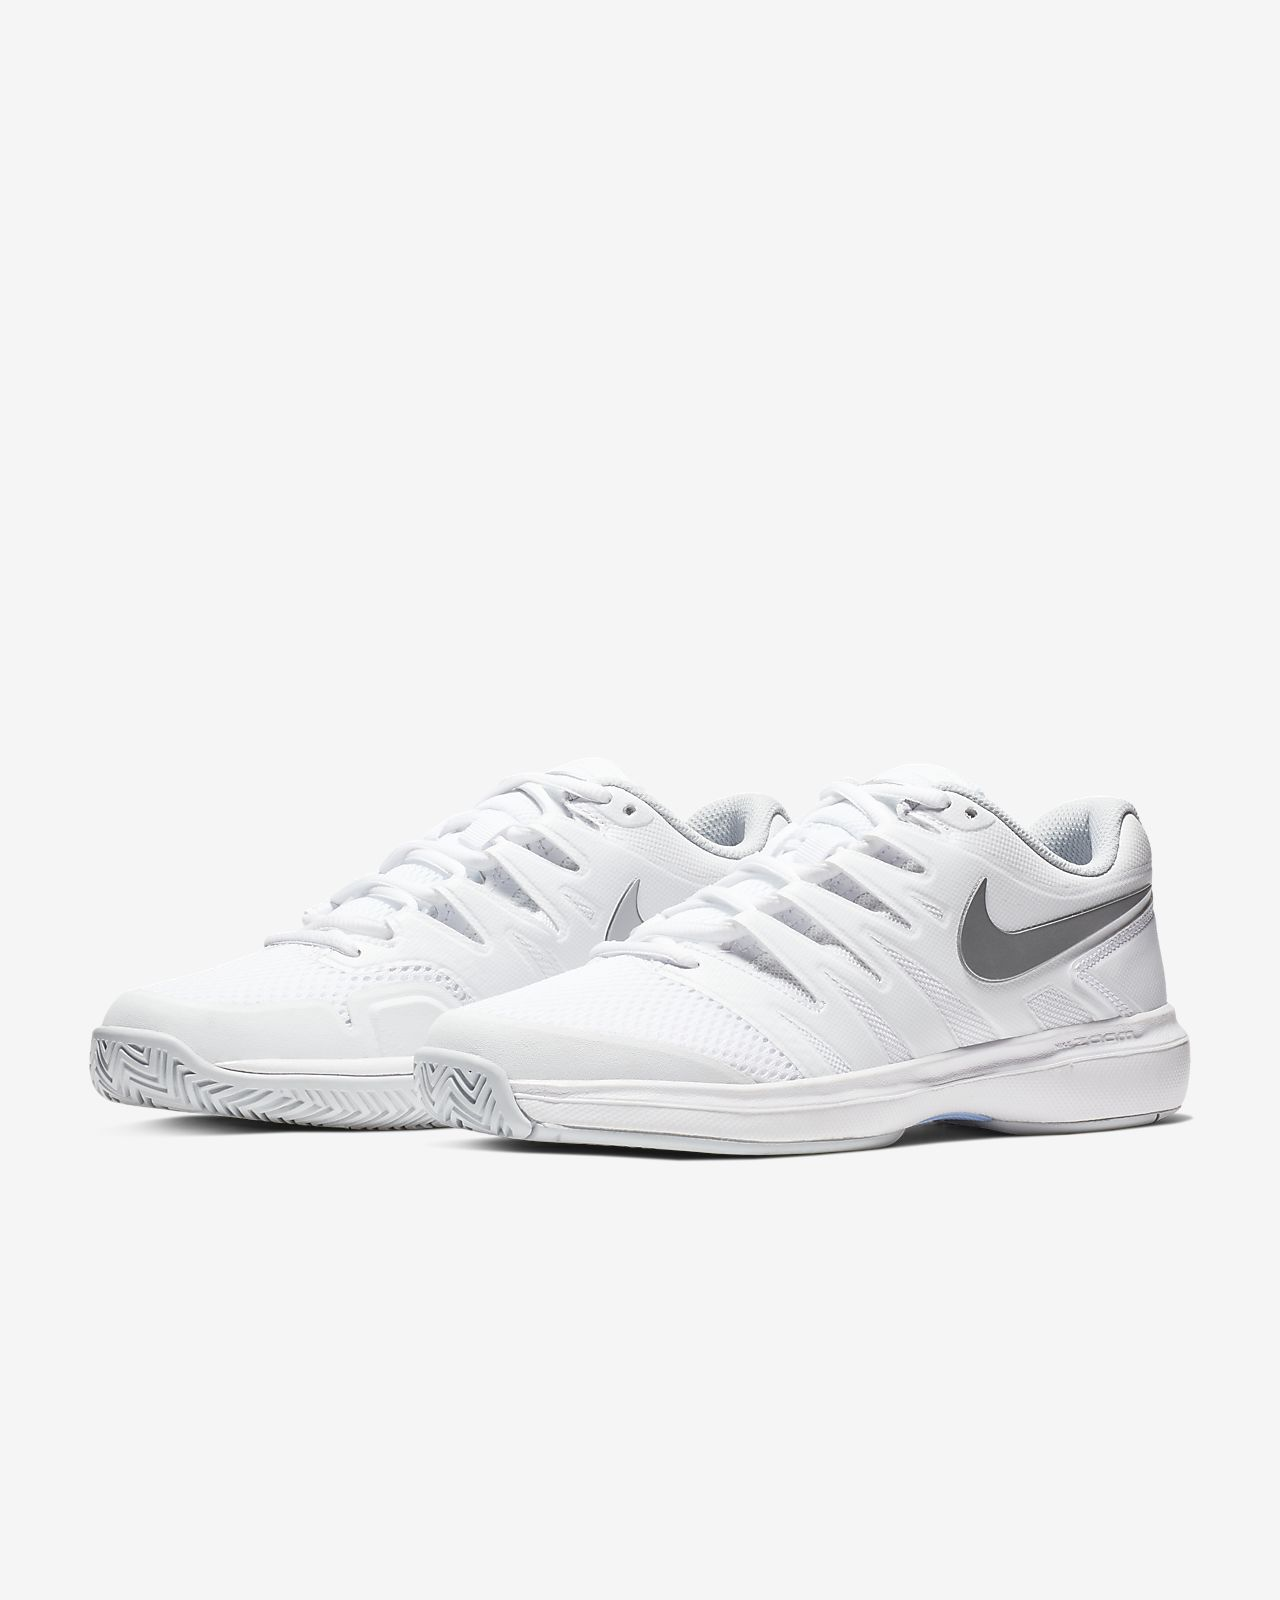 2e84a88f80c1 NikeCourt Air Zoom Prestige Women's Hard Court Tennis Shoe. Nike.com